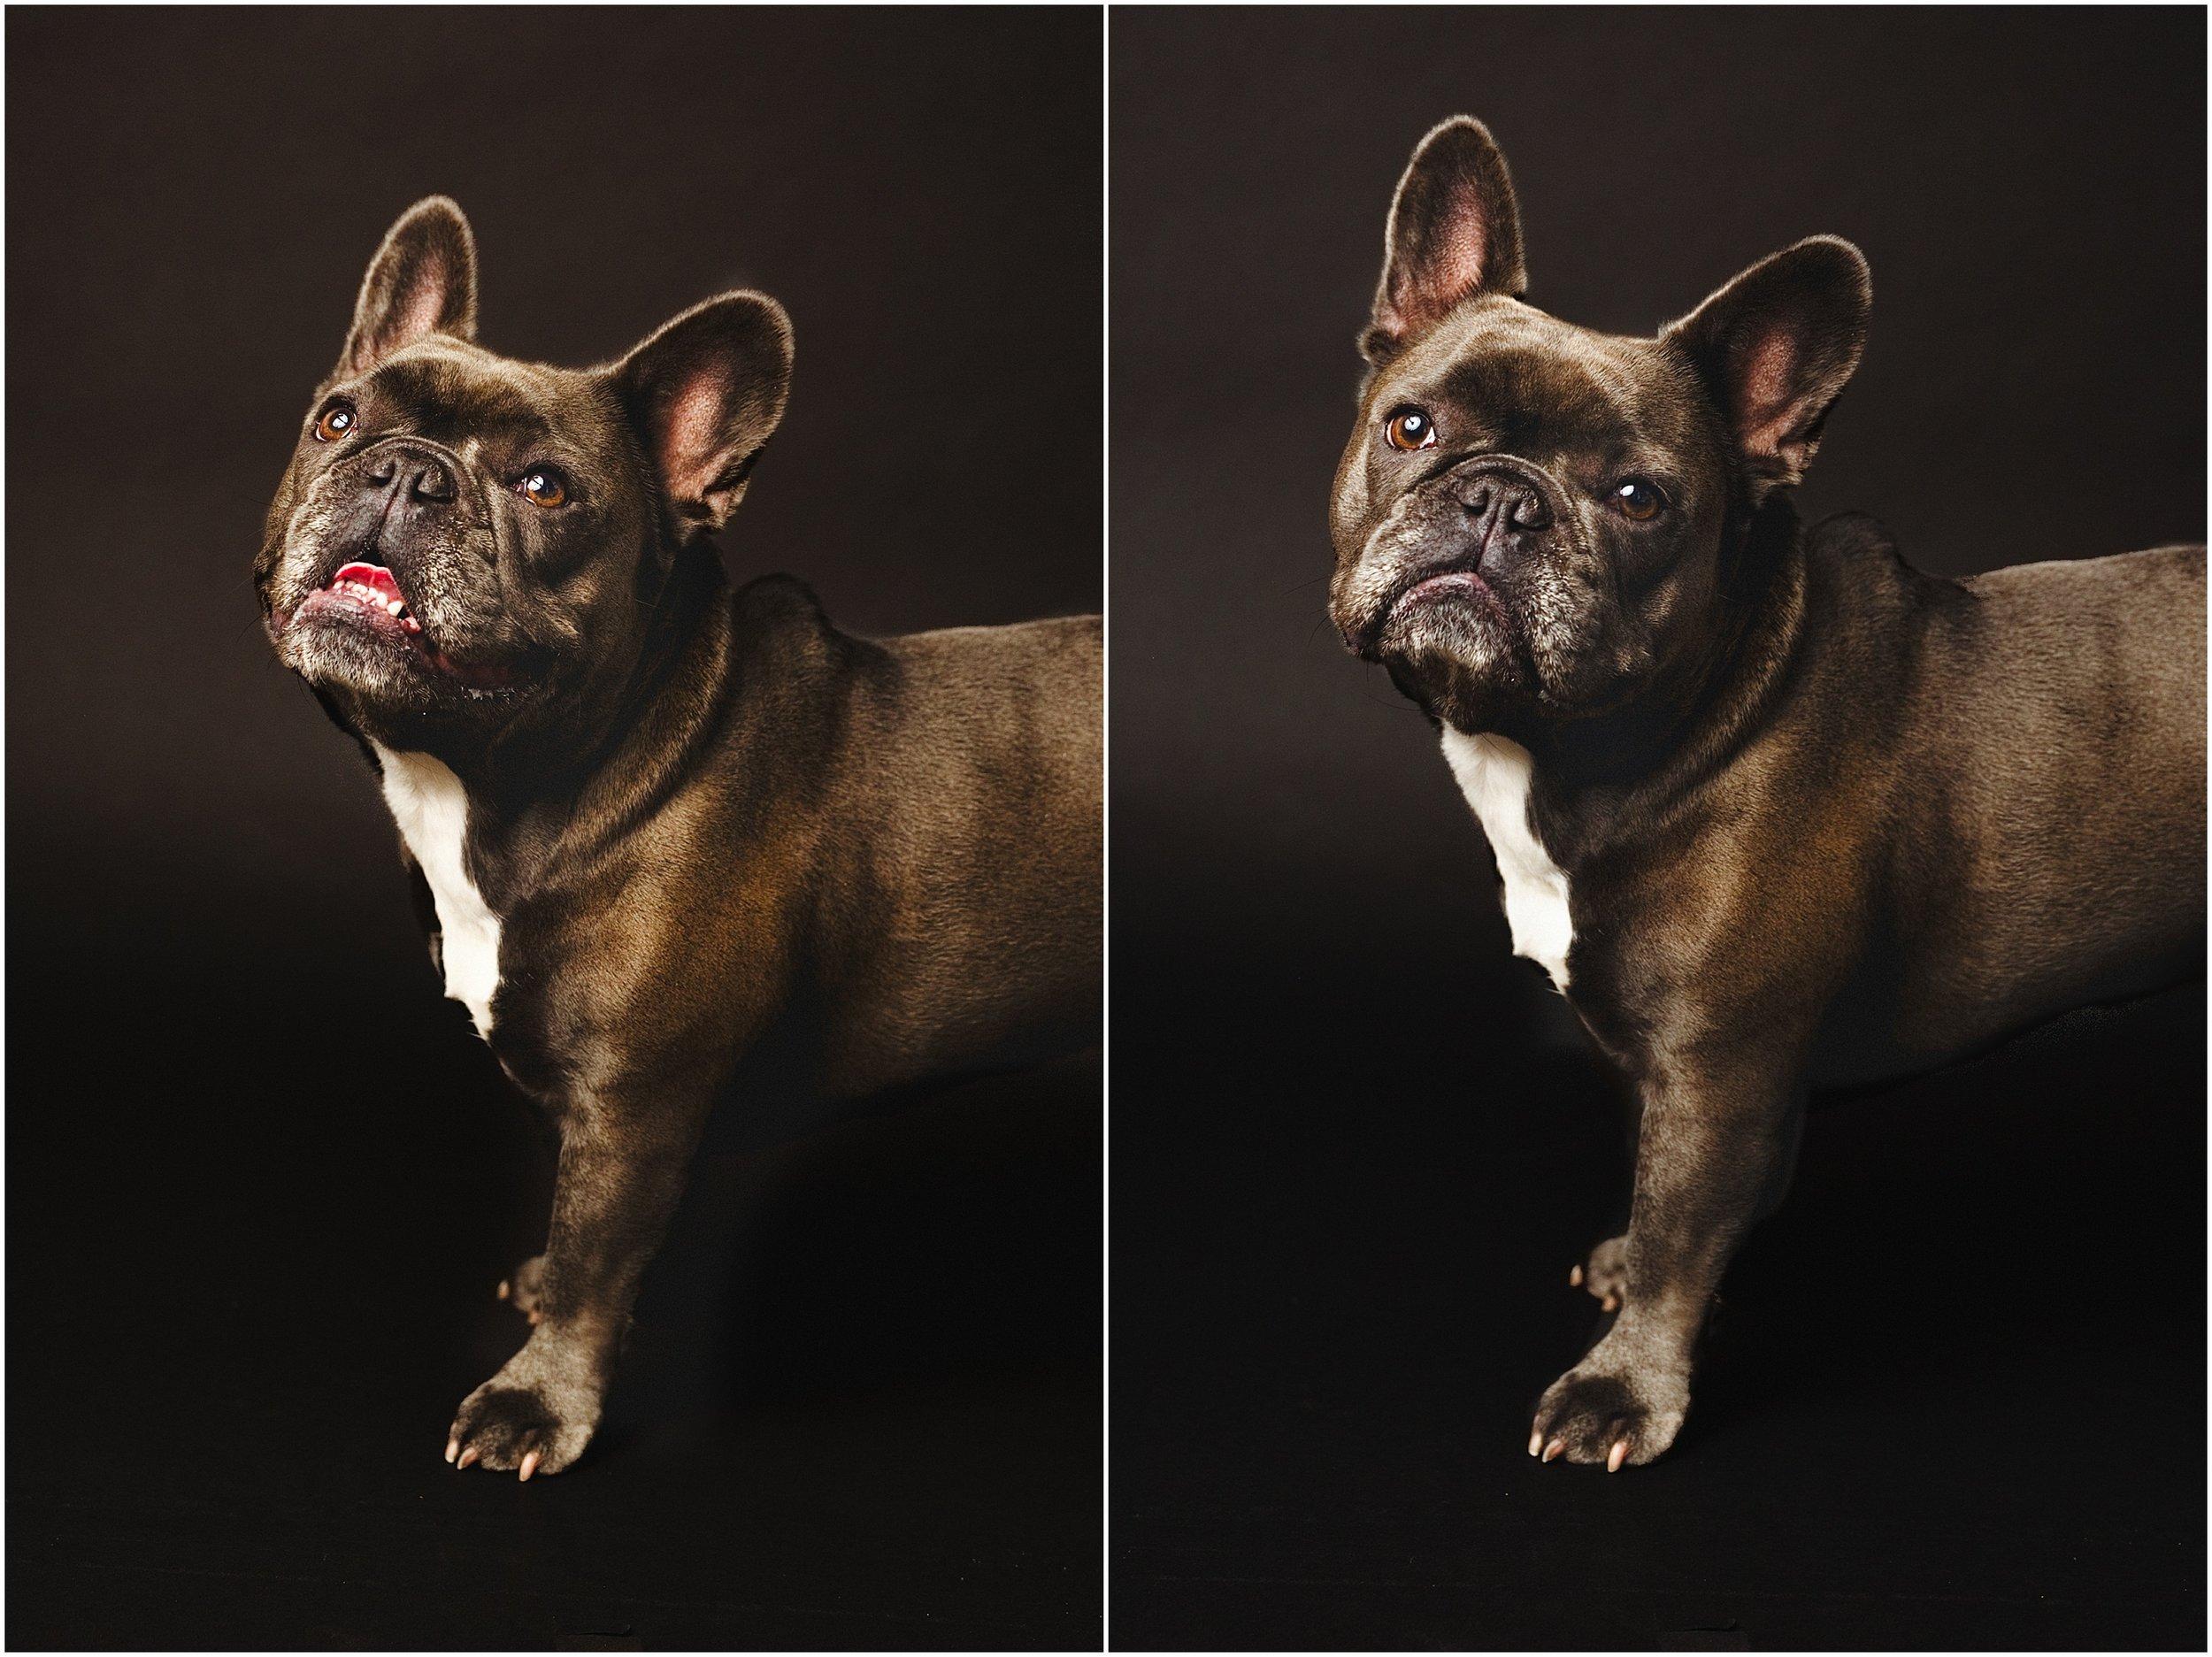 jamie_leonard_photography_pet_studio_dog.jpg